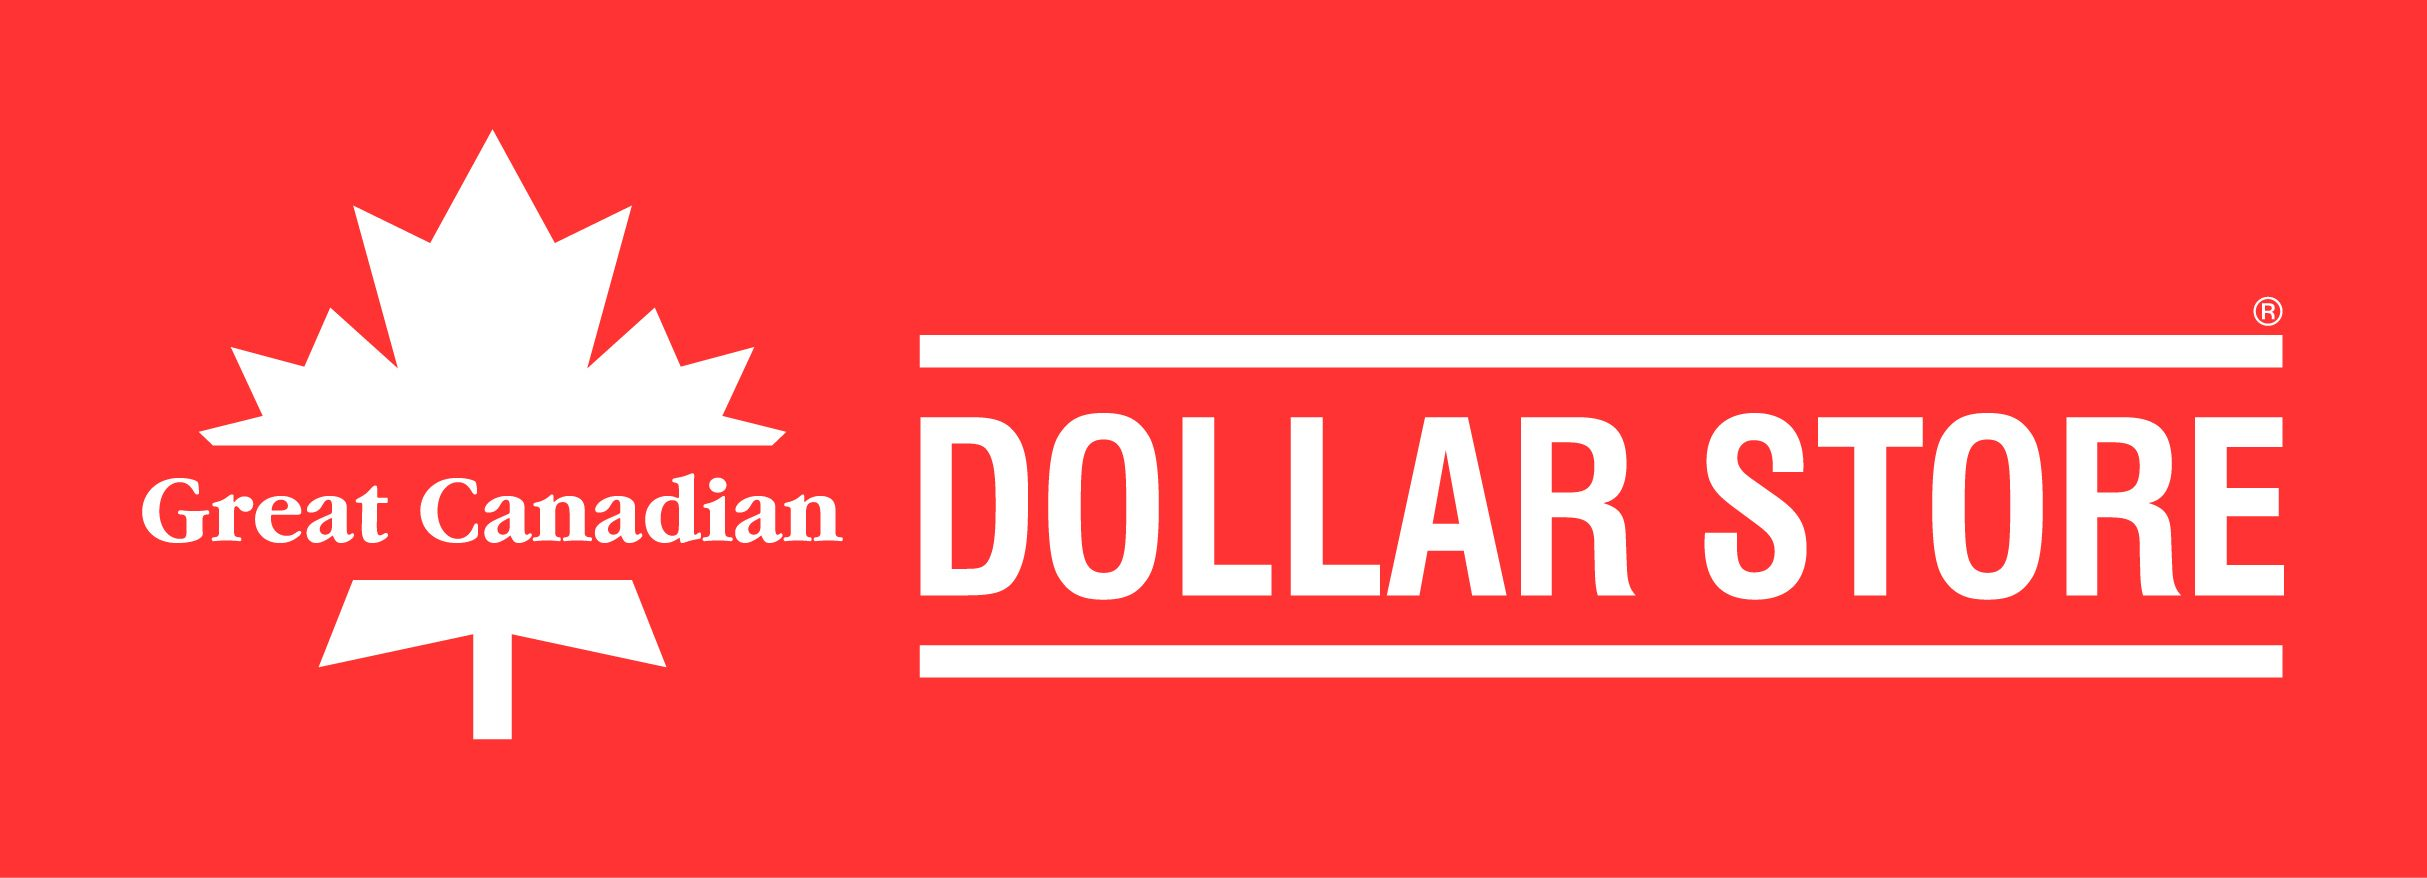 POLE STAR ENTERPRISE INC. O/A GREAT CANADIAN DOLLAR STORE